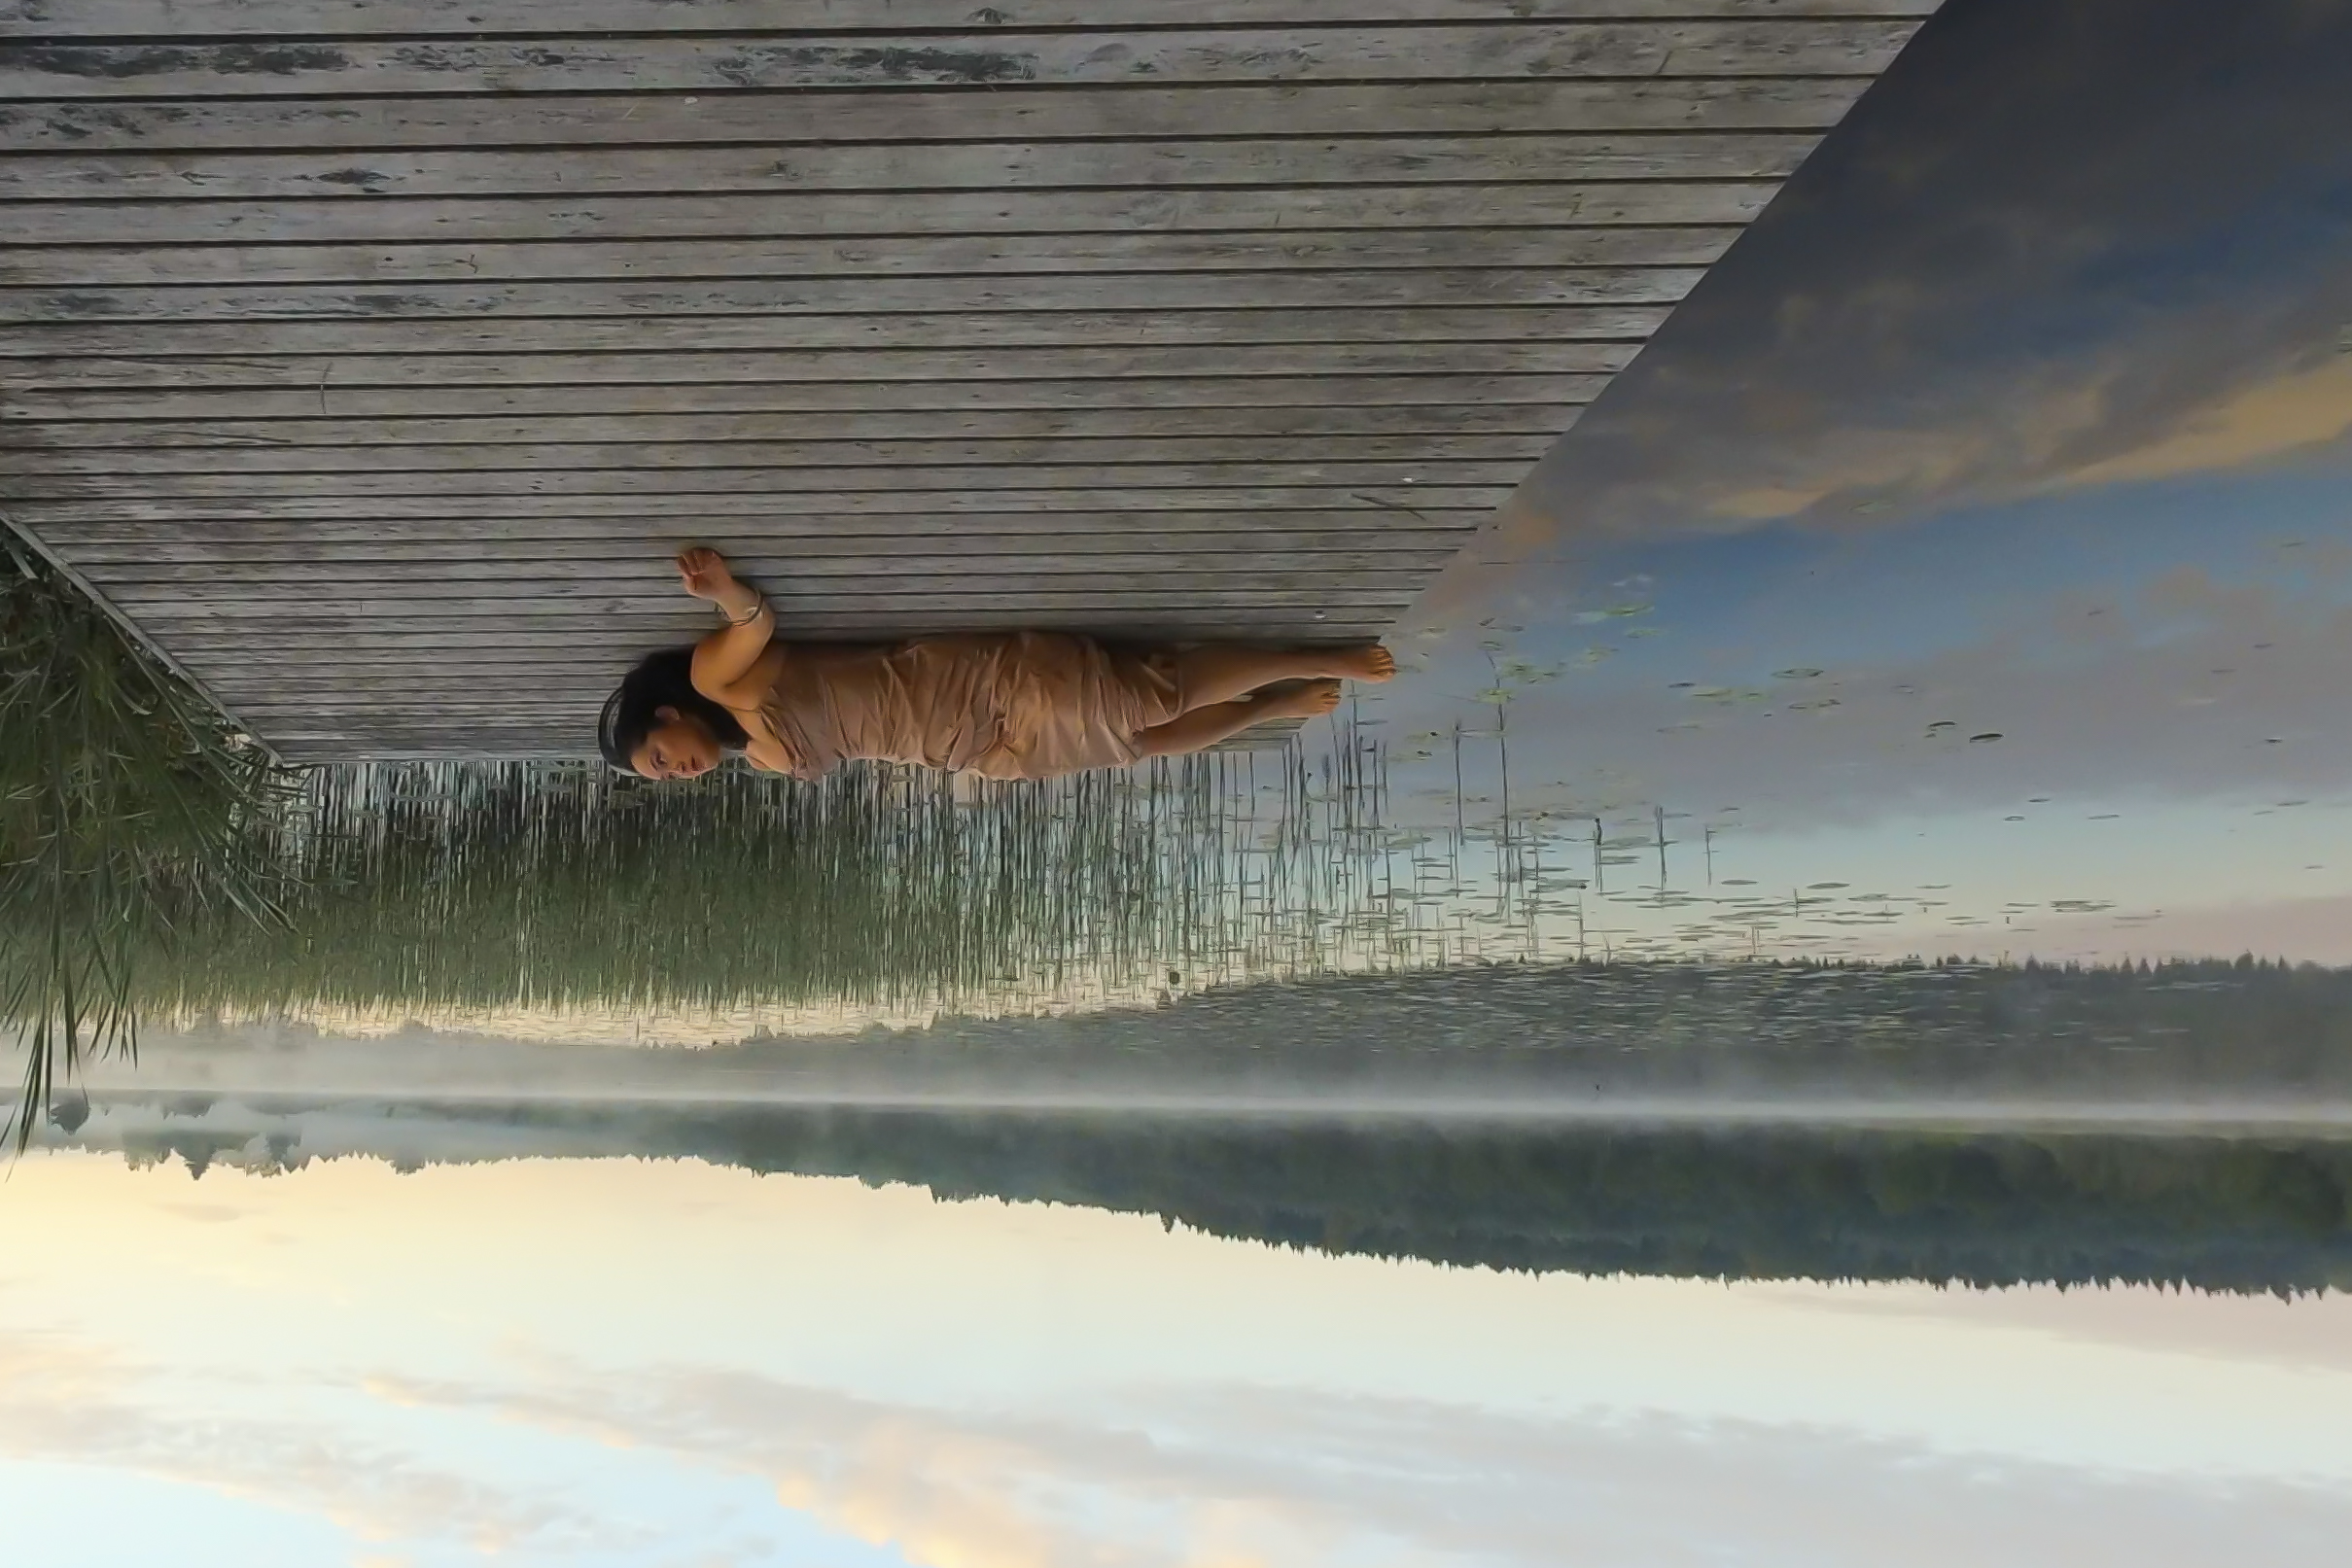 finnish-lake-misty-morning-upside-down-cy-gorman.jpg